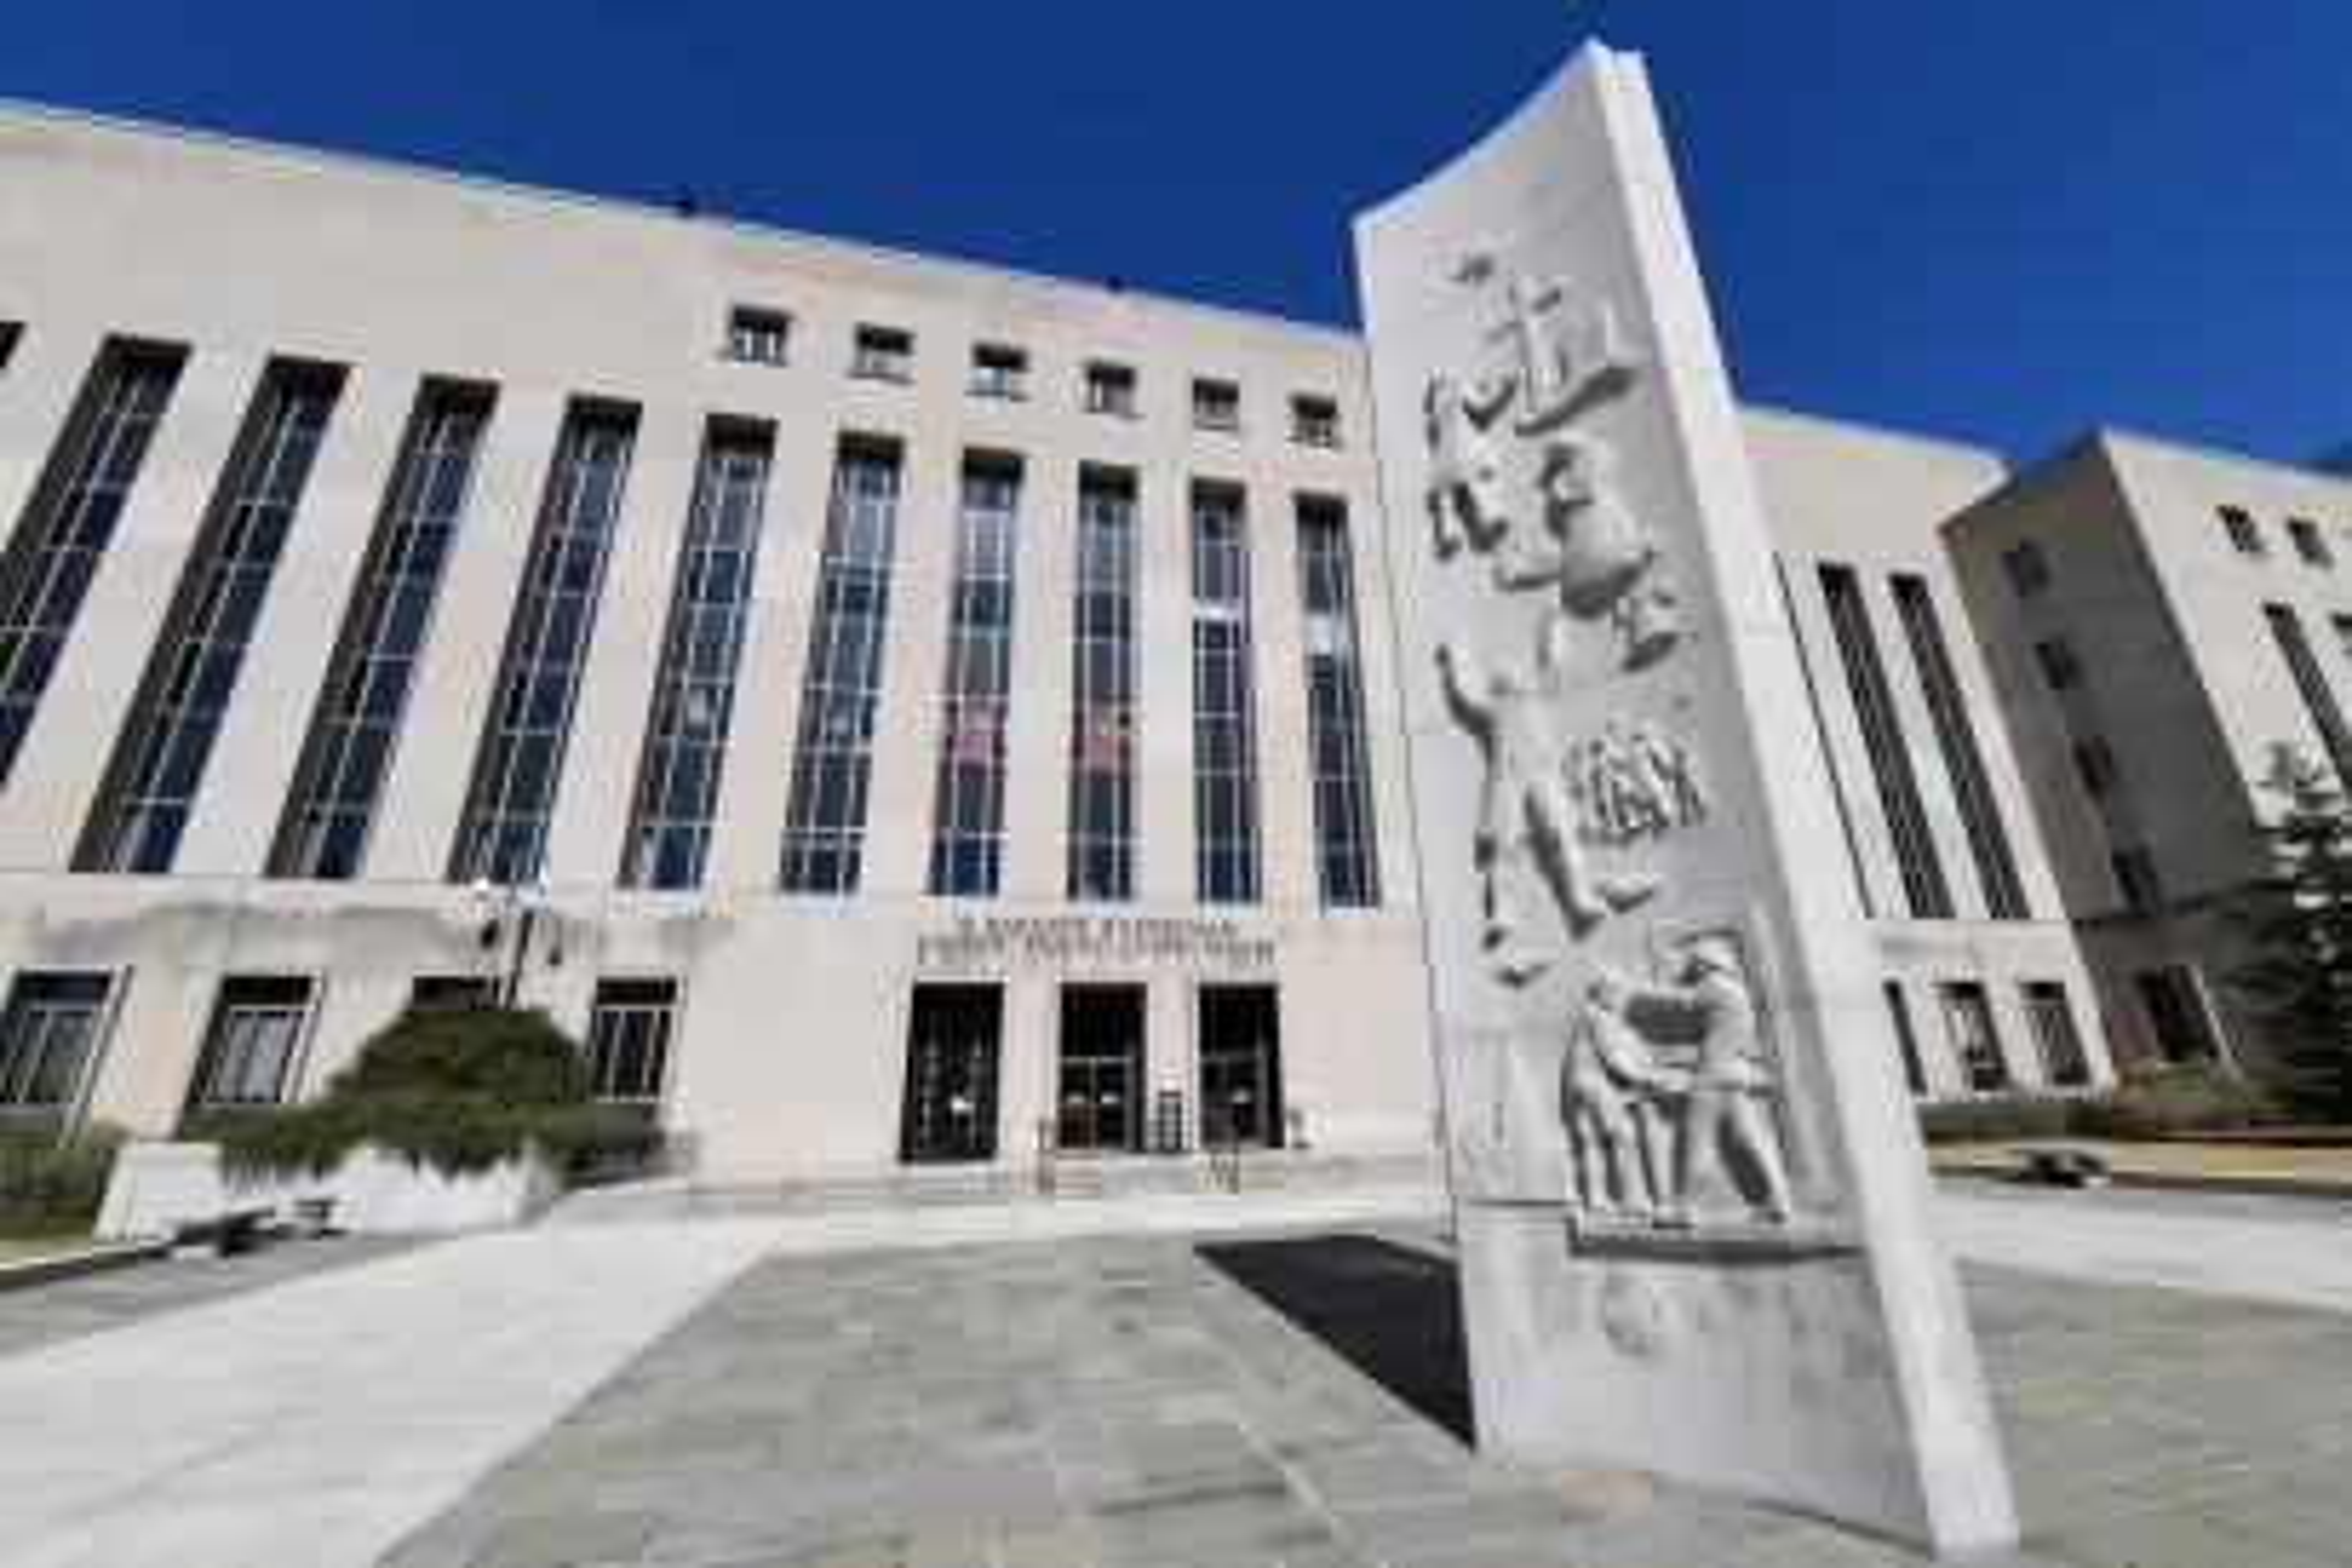 A view of the E. Barrett Prettyman Courthouse in Washington